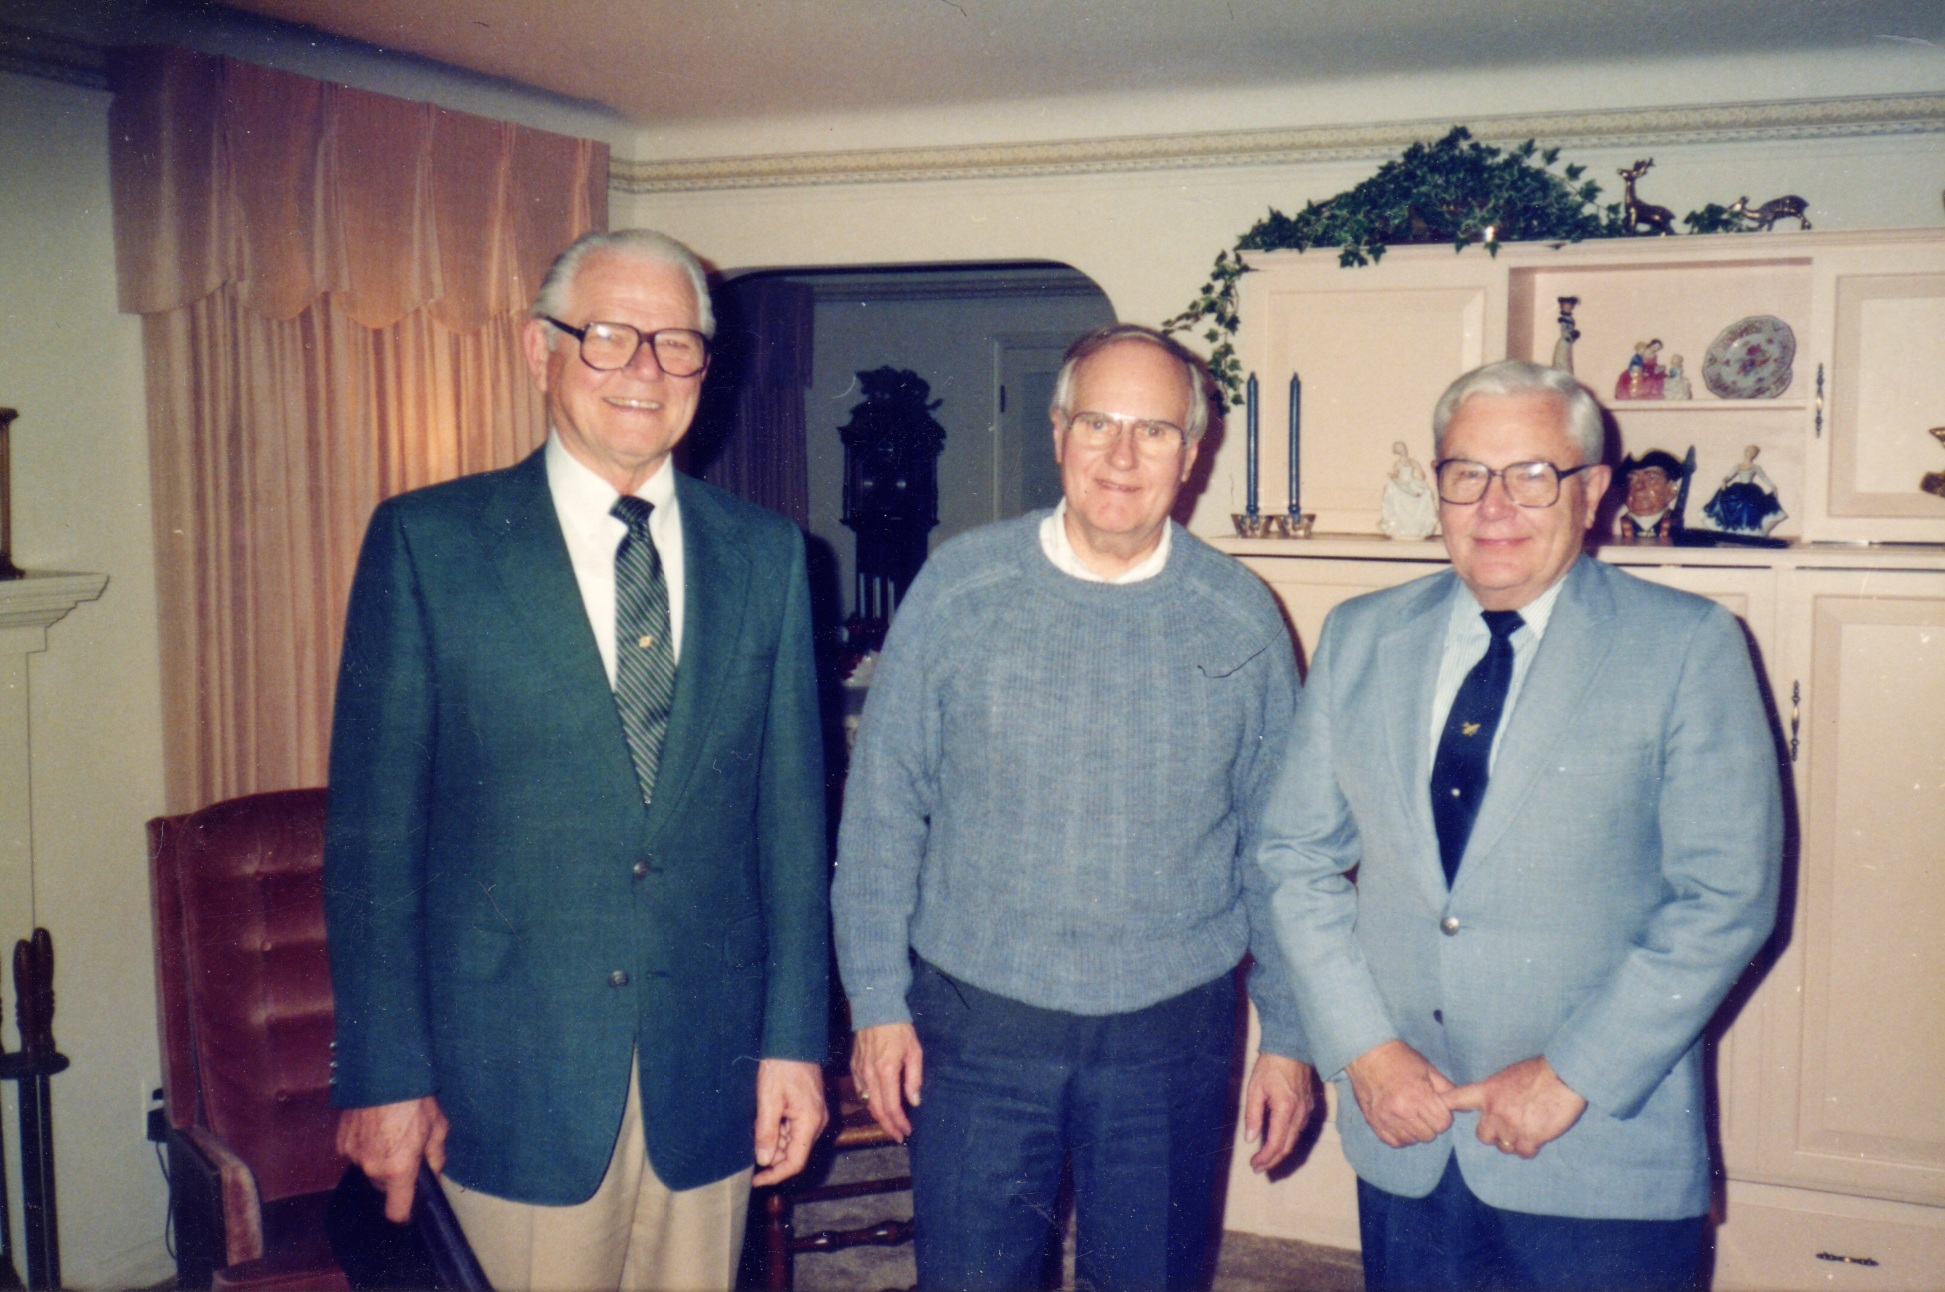 Left to right: Corman Bean, Bill Dewey, George Collar